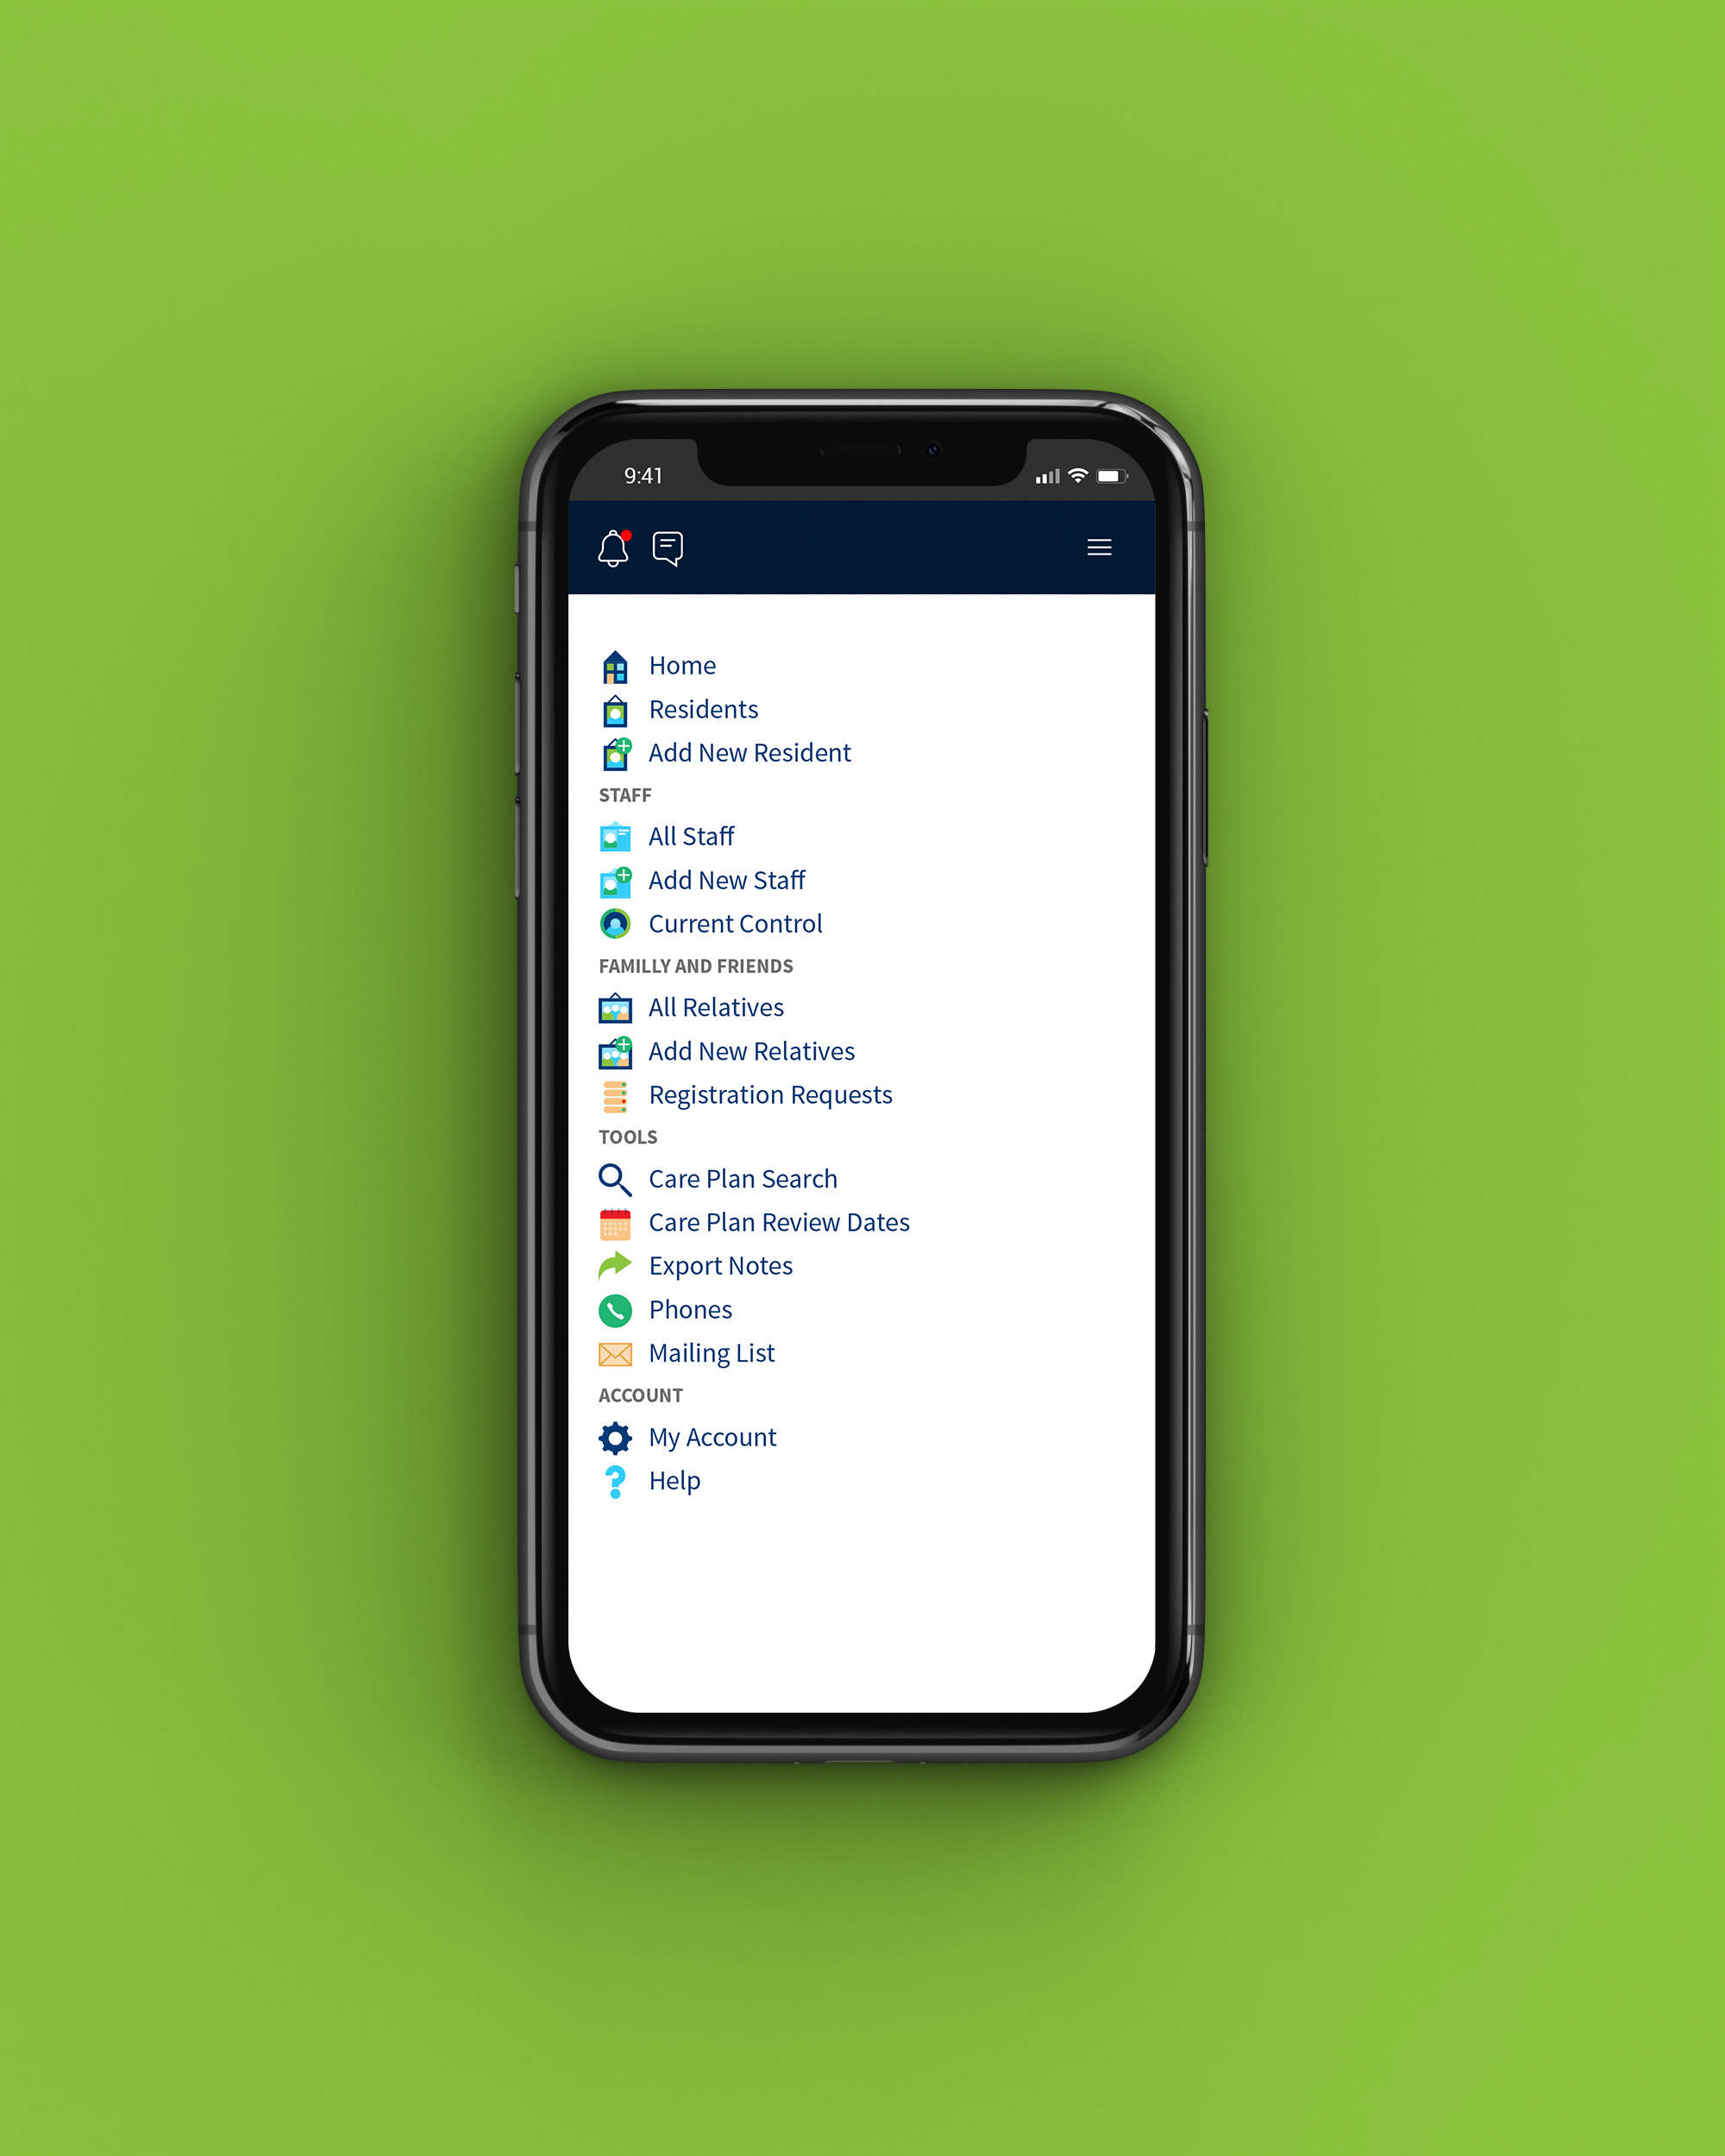 Care home management system mobile web application for Graham Care